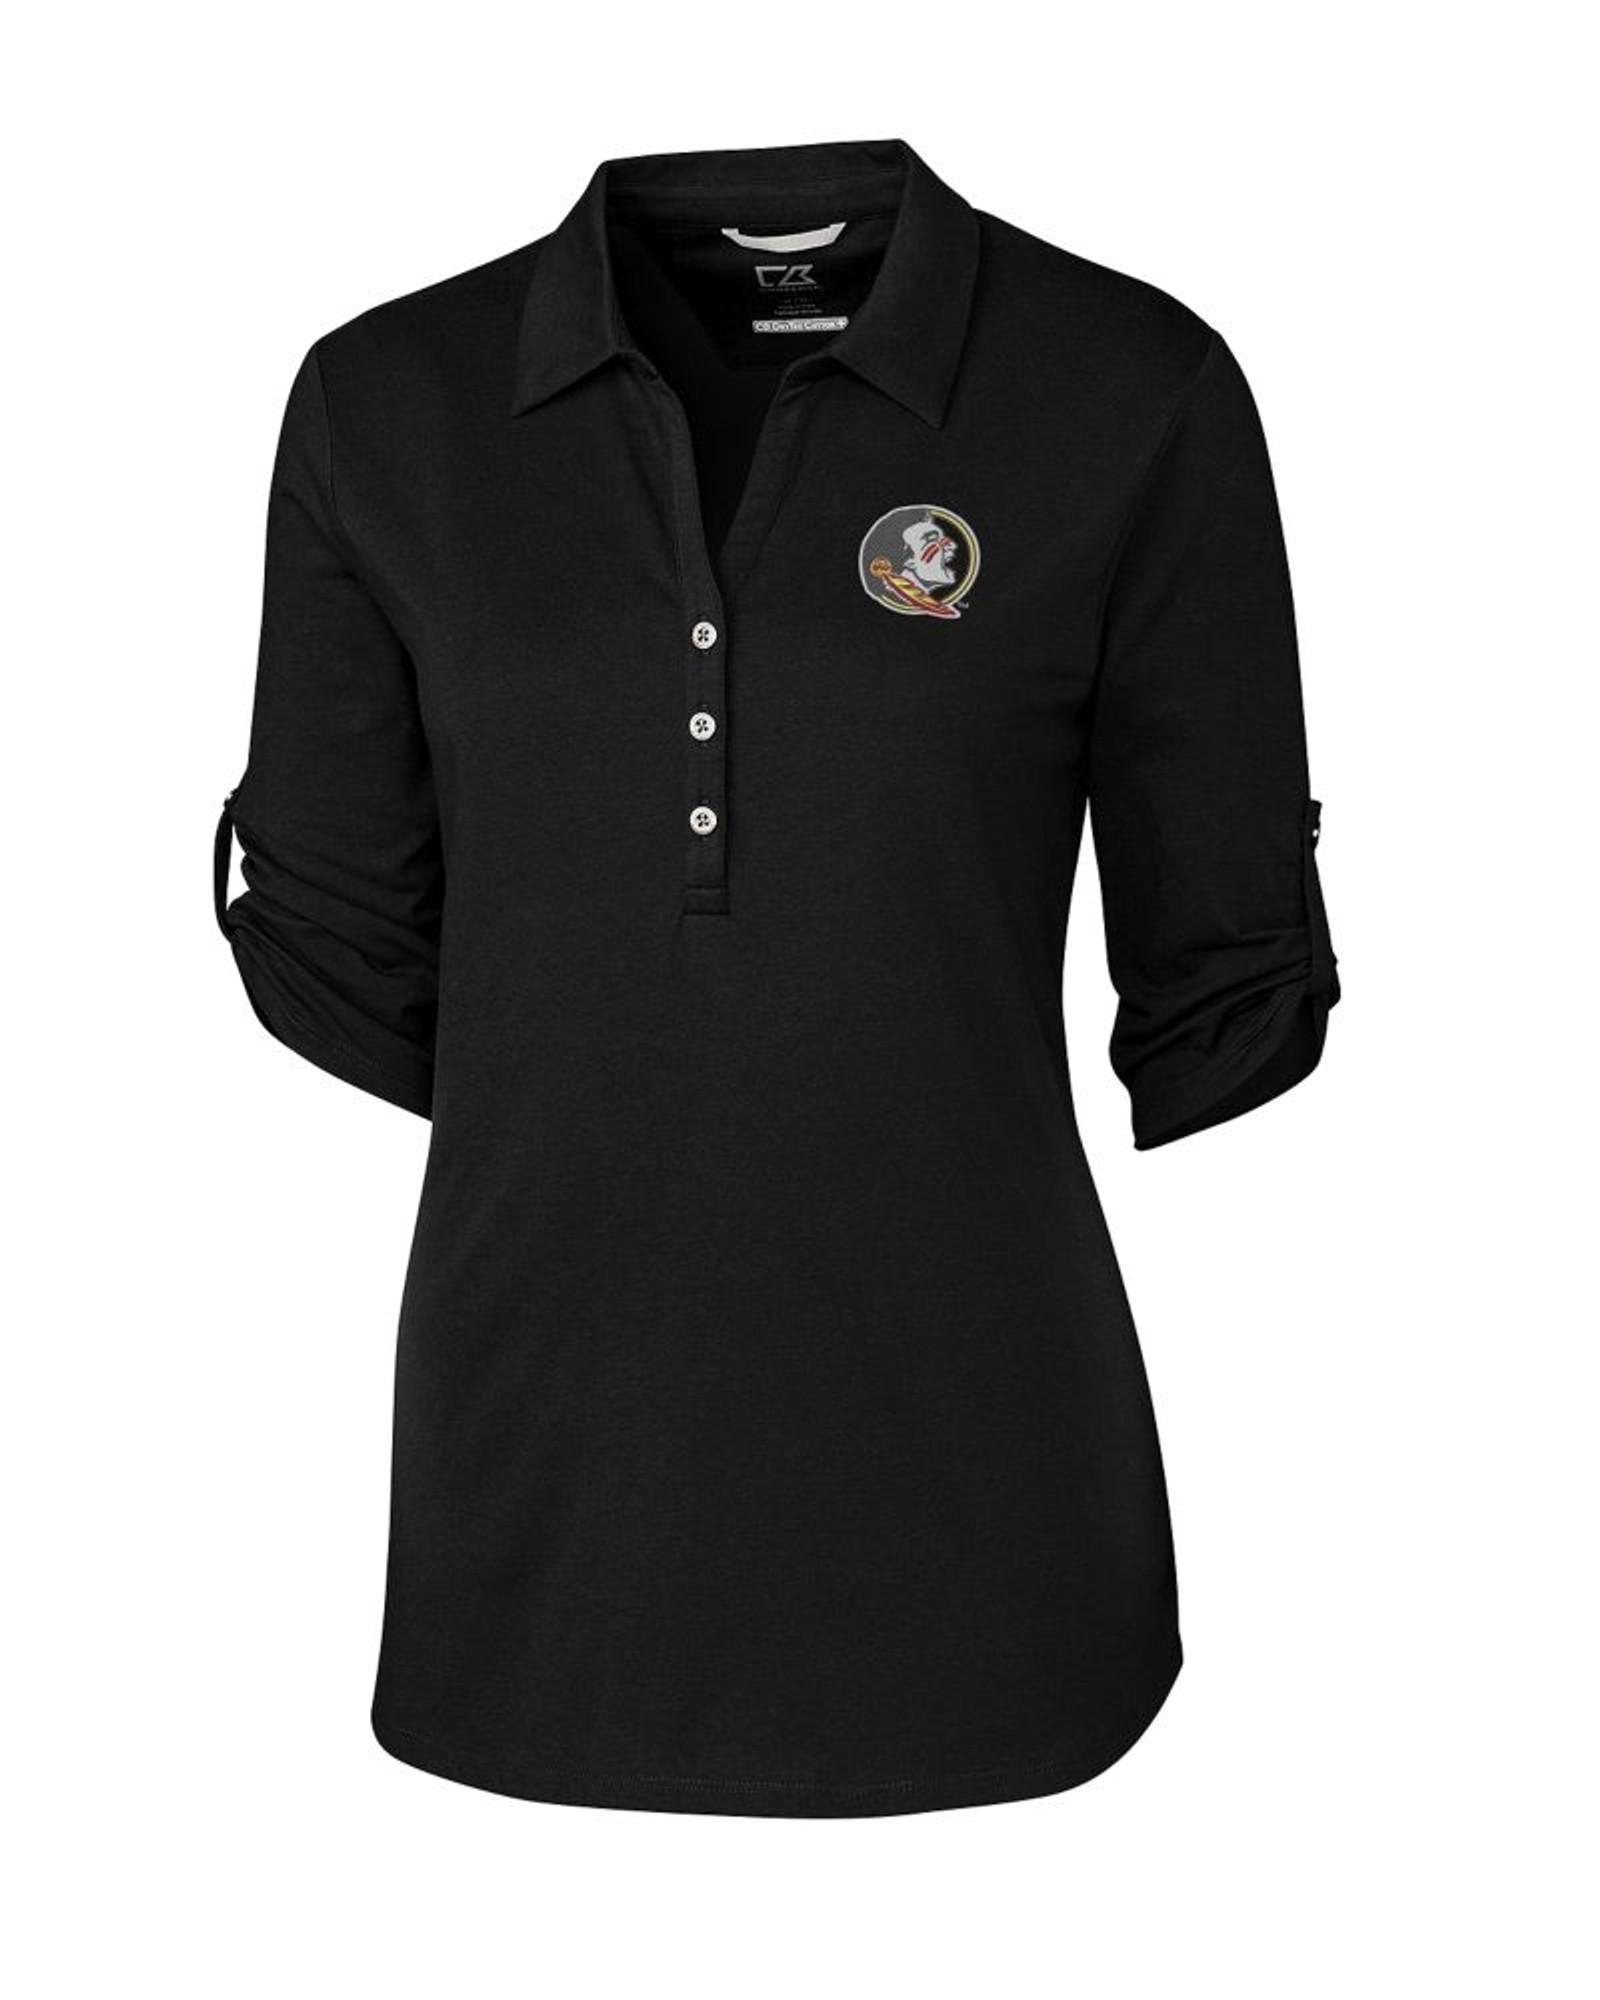 17ae4d62c43 Florida State University Seminoles Women's E/S Thrive Polo